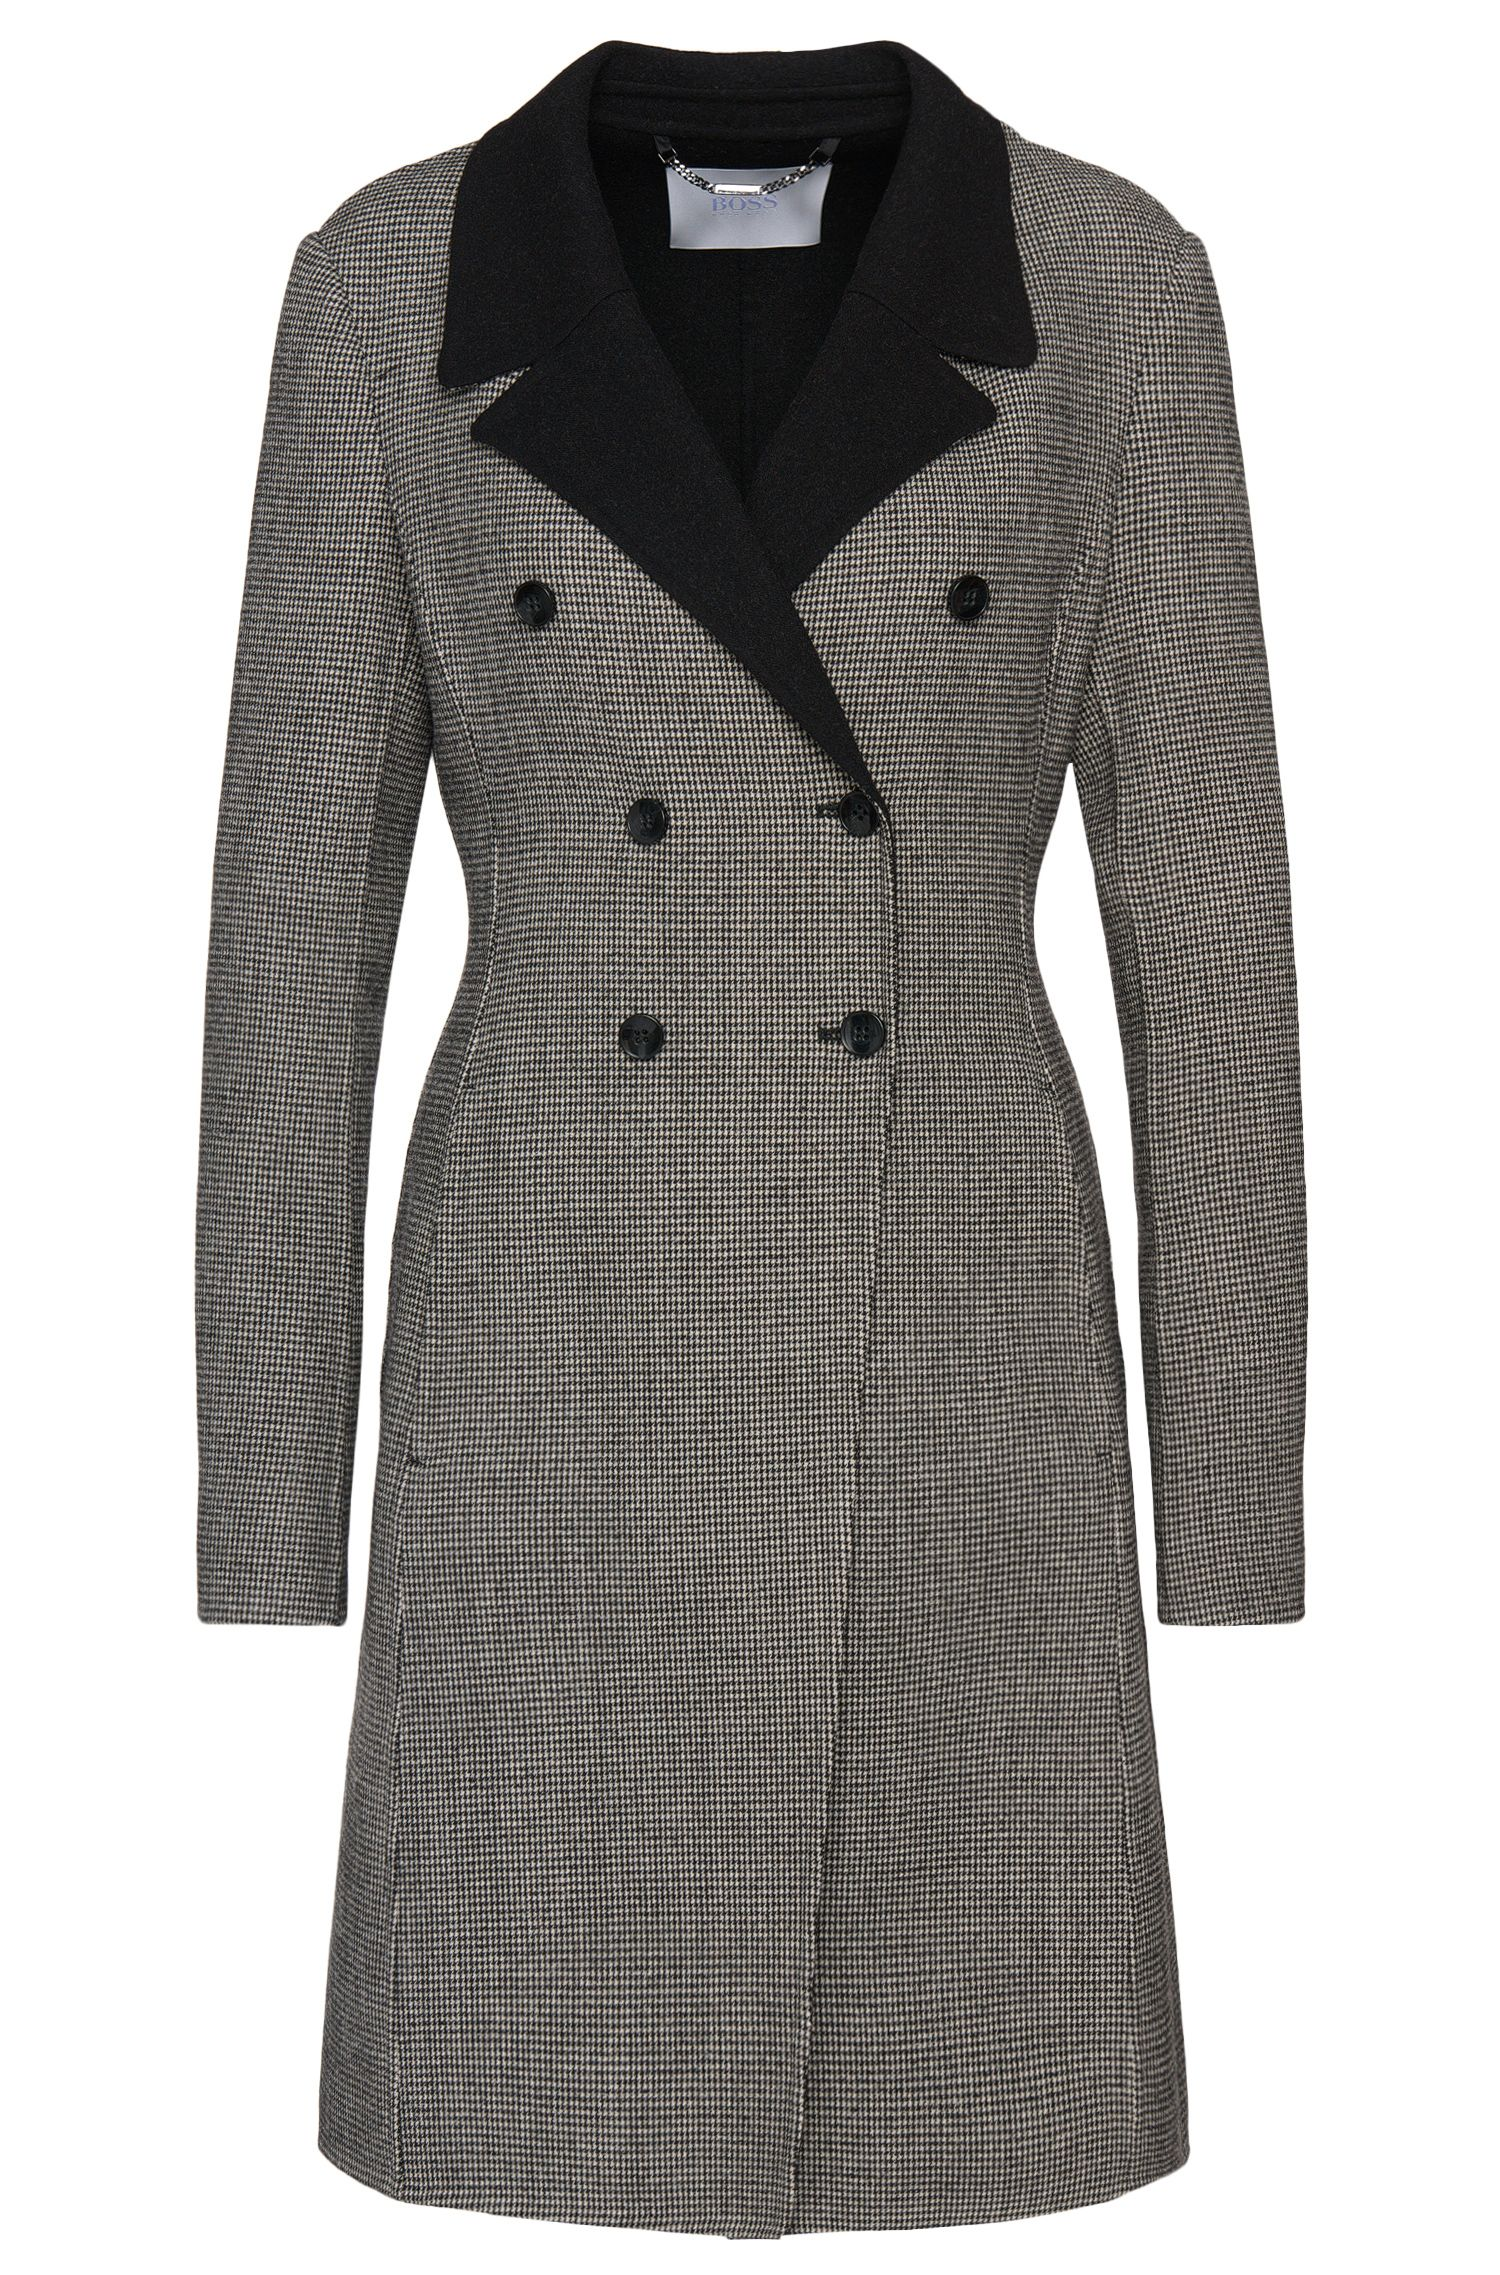 Abrigo en mezcla de lana elástica con estampado de pata de gallo: 'Cucina1'